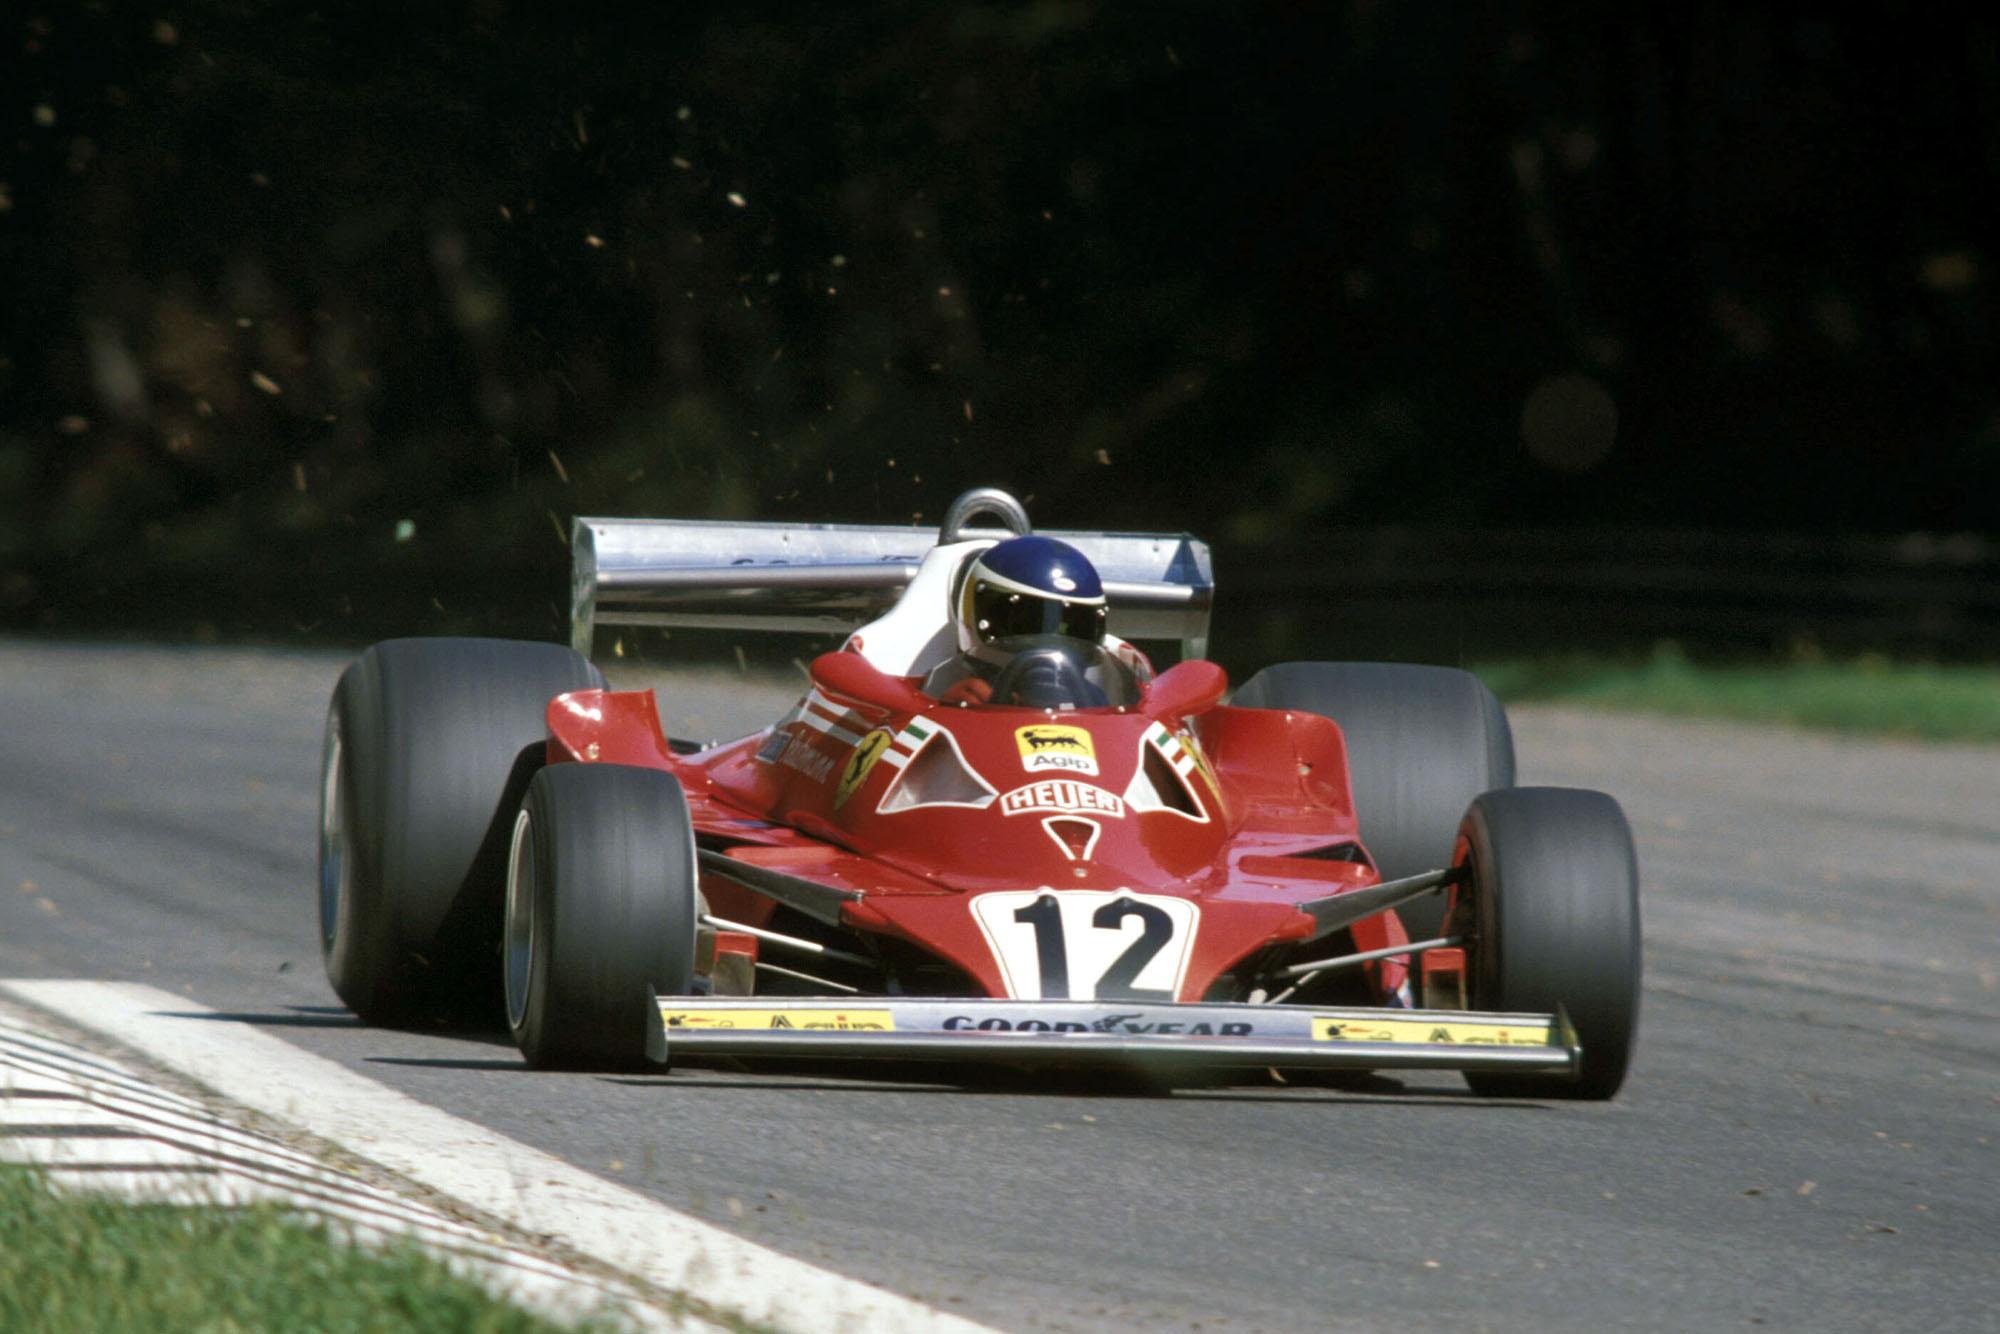 Carlos Reutemann (Ferrari) driving at the 1977 Italian Grand Prix, Monza.